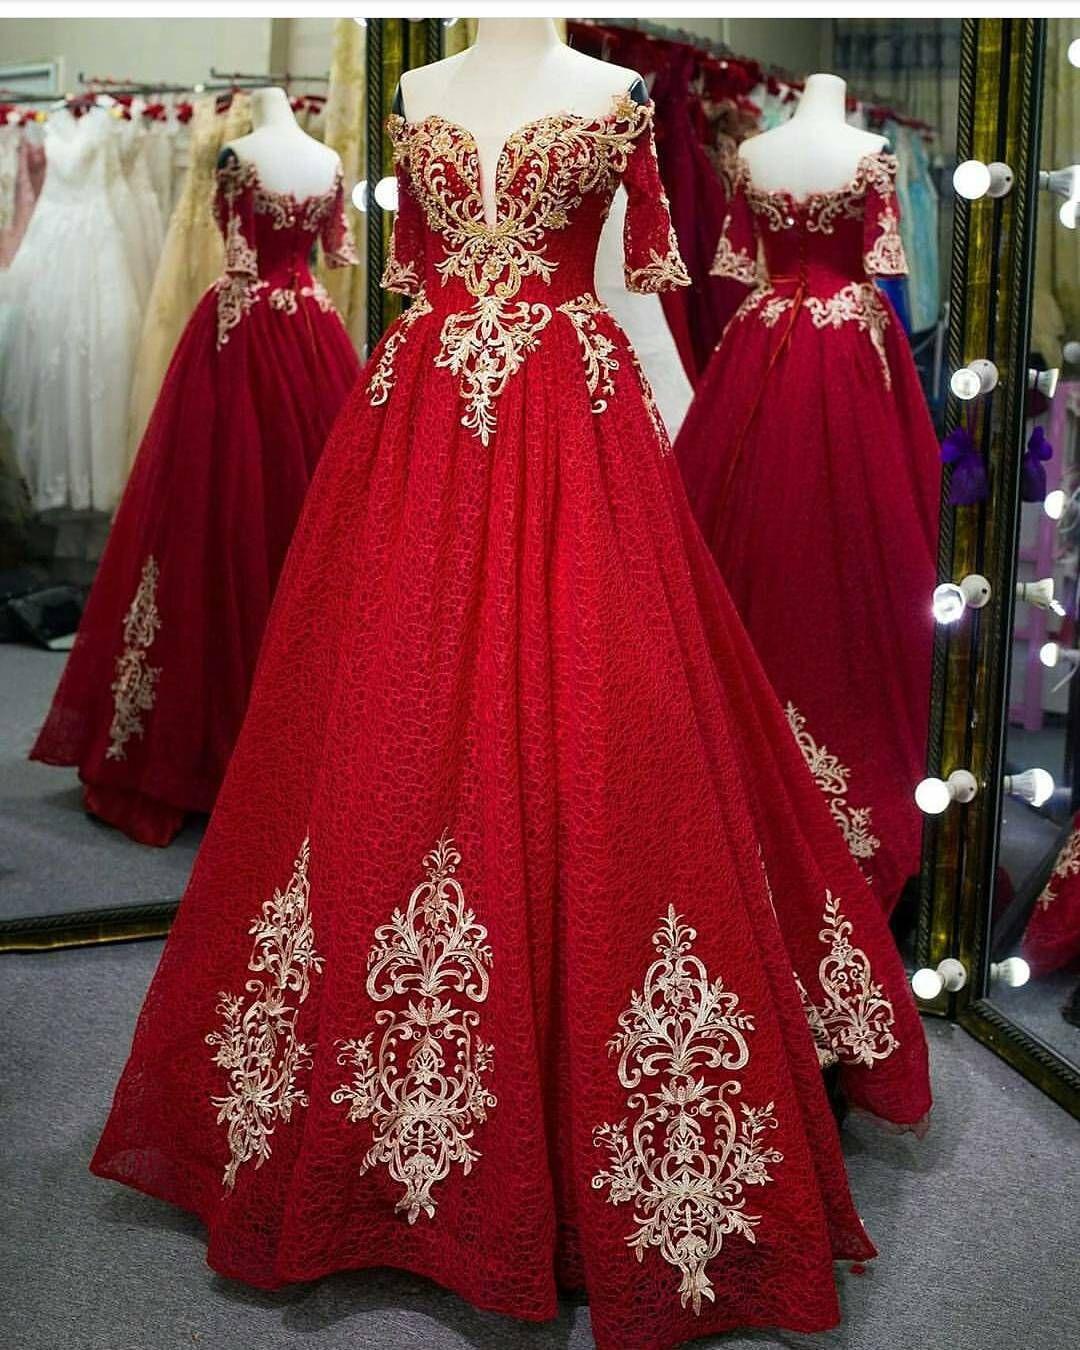 iletişim: 16 #weddingdresses #wedding #weddingdress